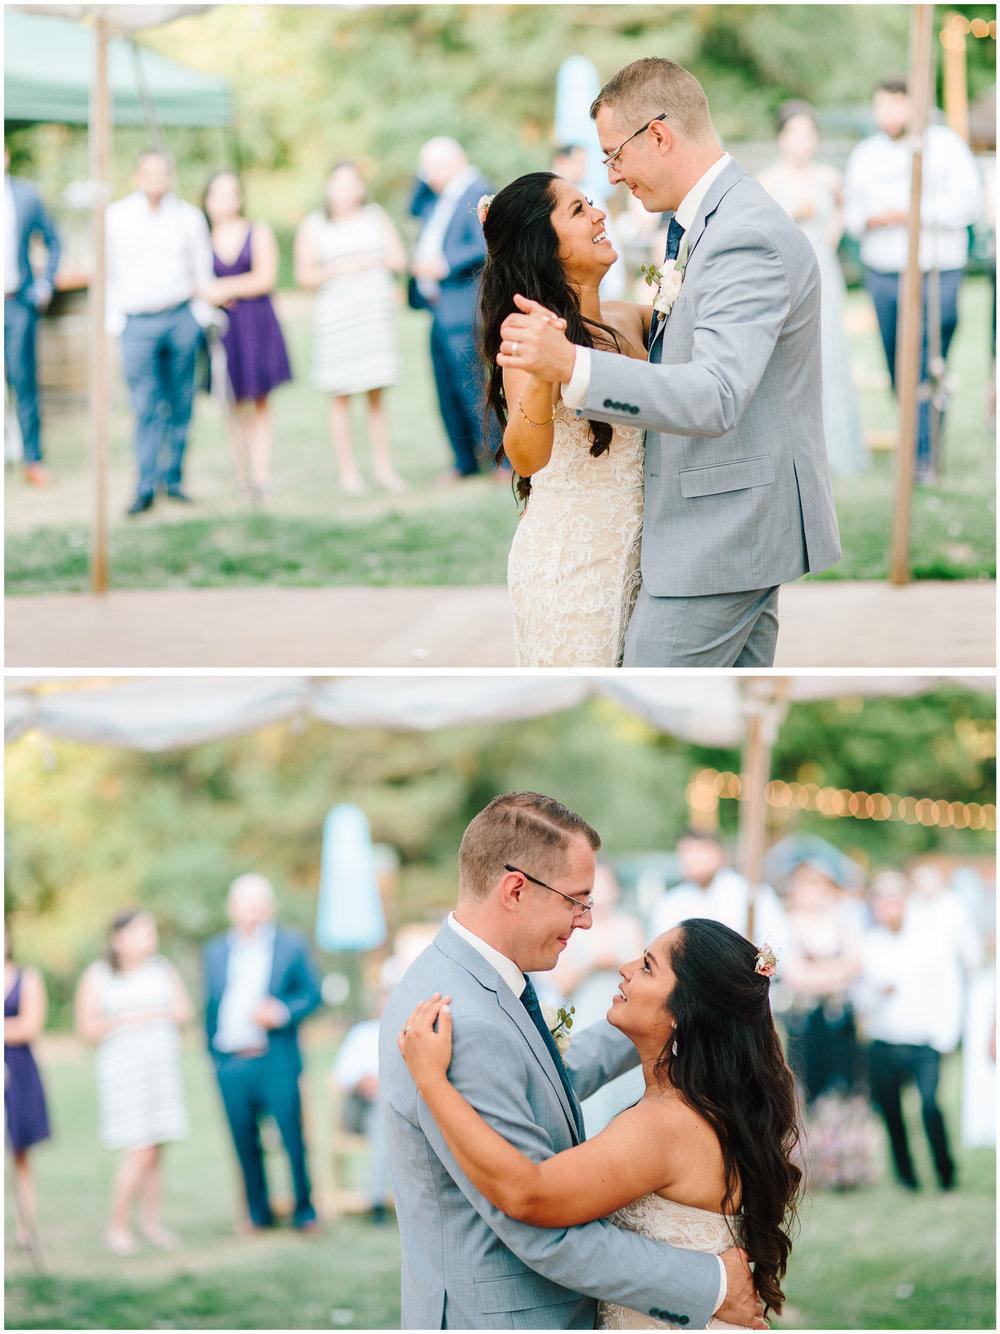 lyons_farmette_wedding_72.jpg